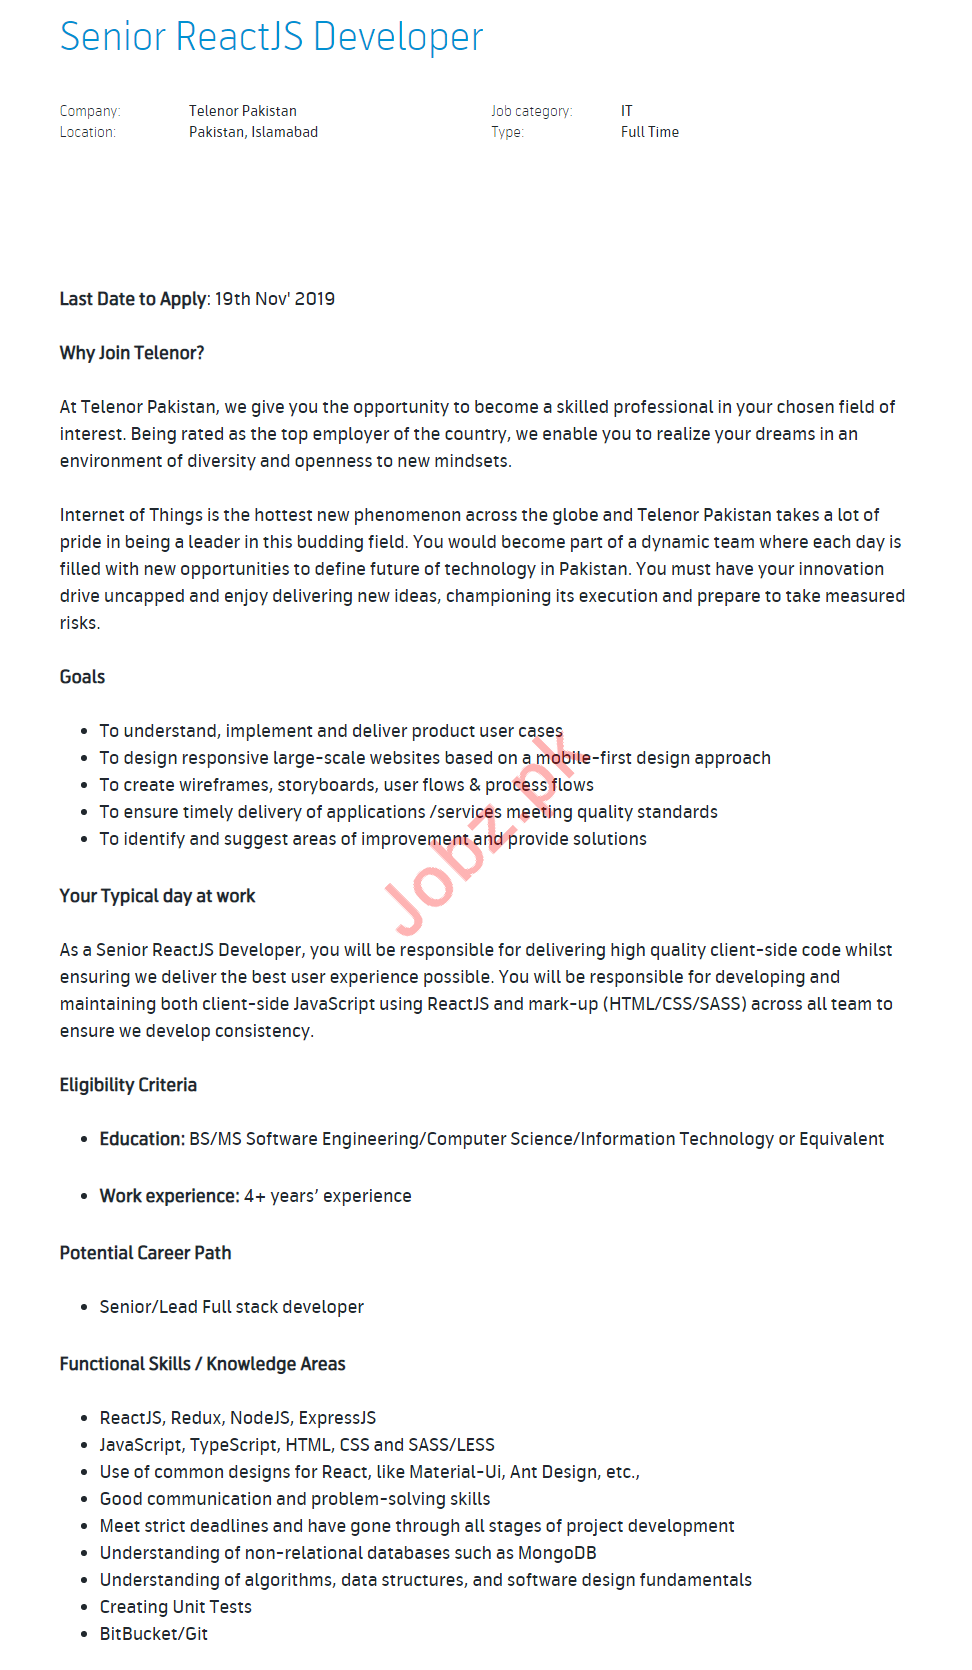 Senior ReactJS Developer Job 2019 in Islamabad